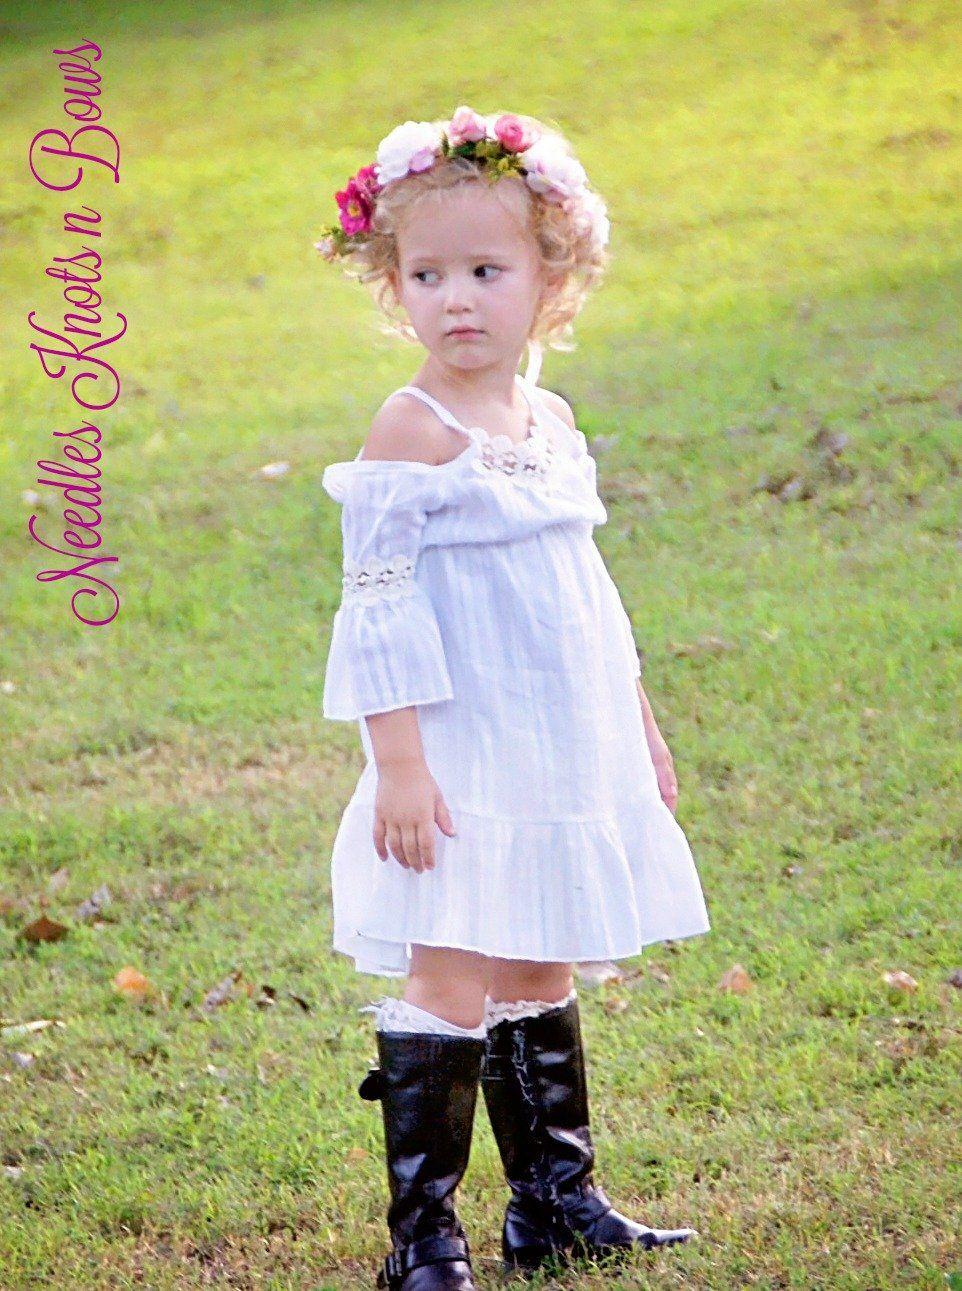 81aa6cd58cca Girls White Over the Shoulder Bohemian Style Dress, Toddlers, Girls Boho Summer  Dress, Beach Dress, Wedding, Flower Girl Dress, Sizes 1, 2, 3, 4, 5, 6, 8,  ...